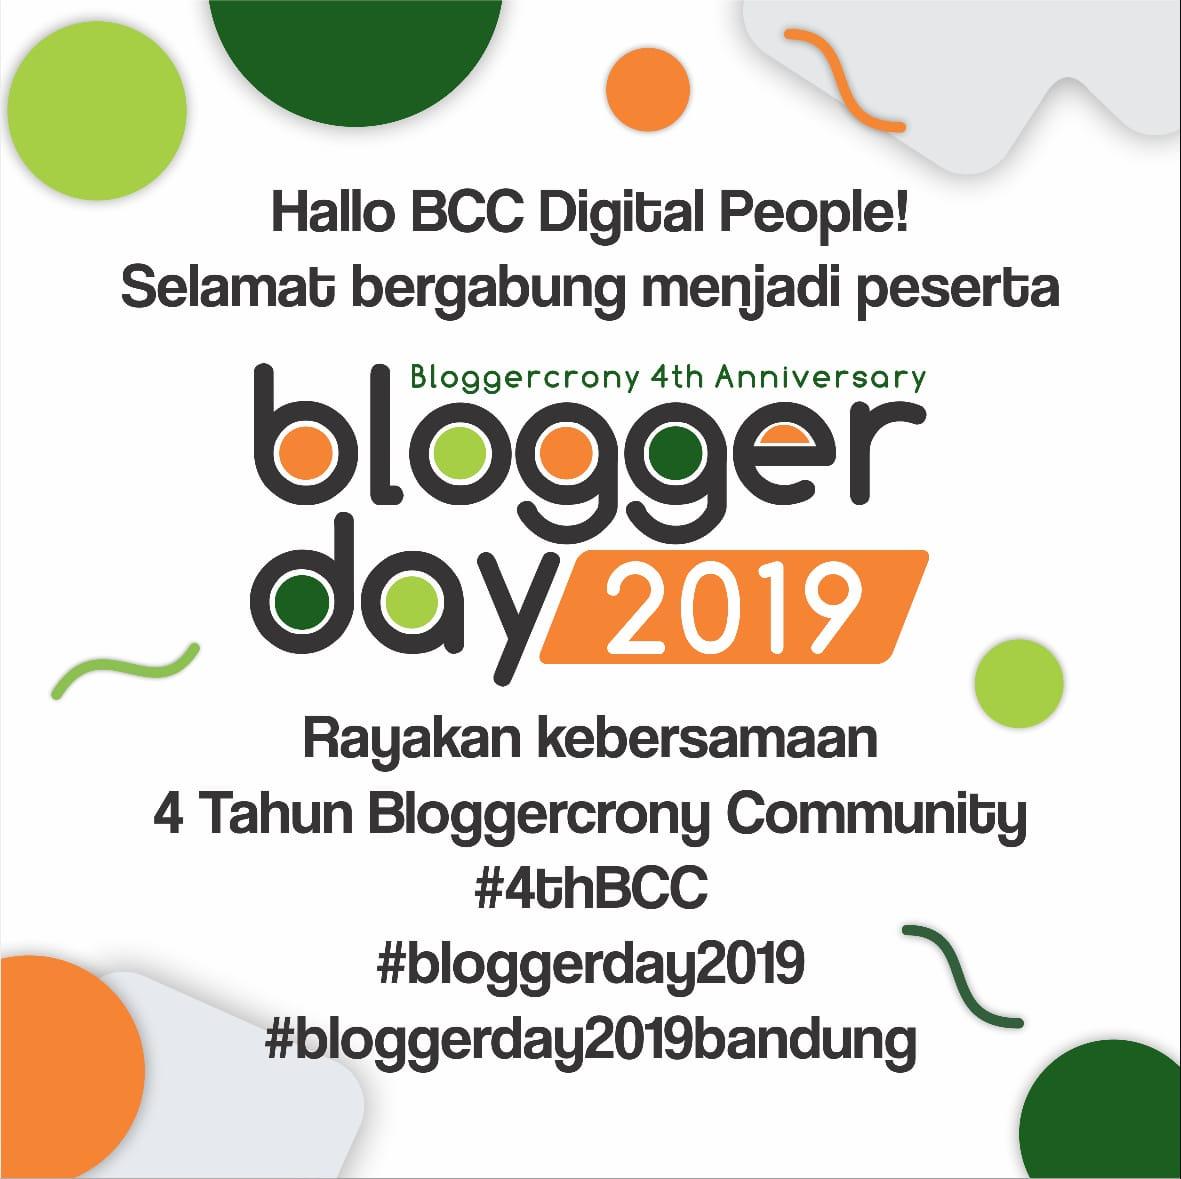 BloggerDay 2019